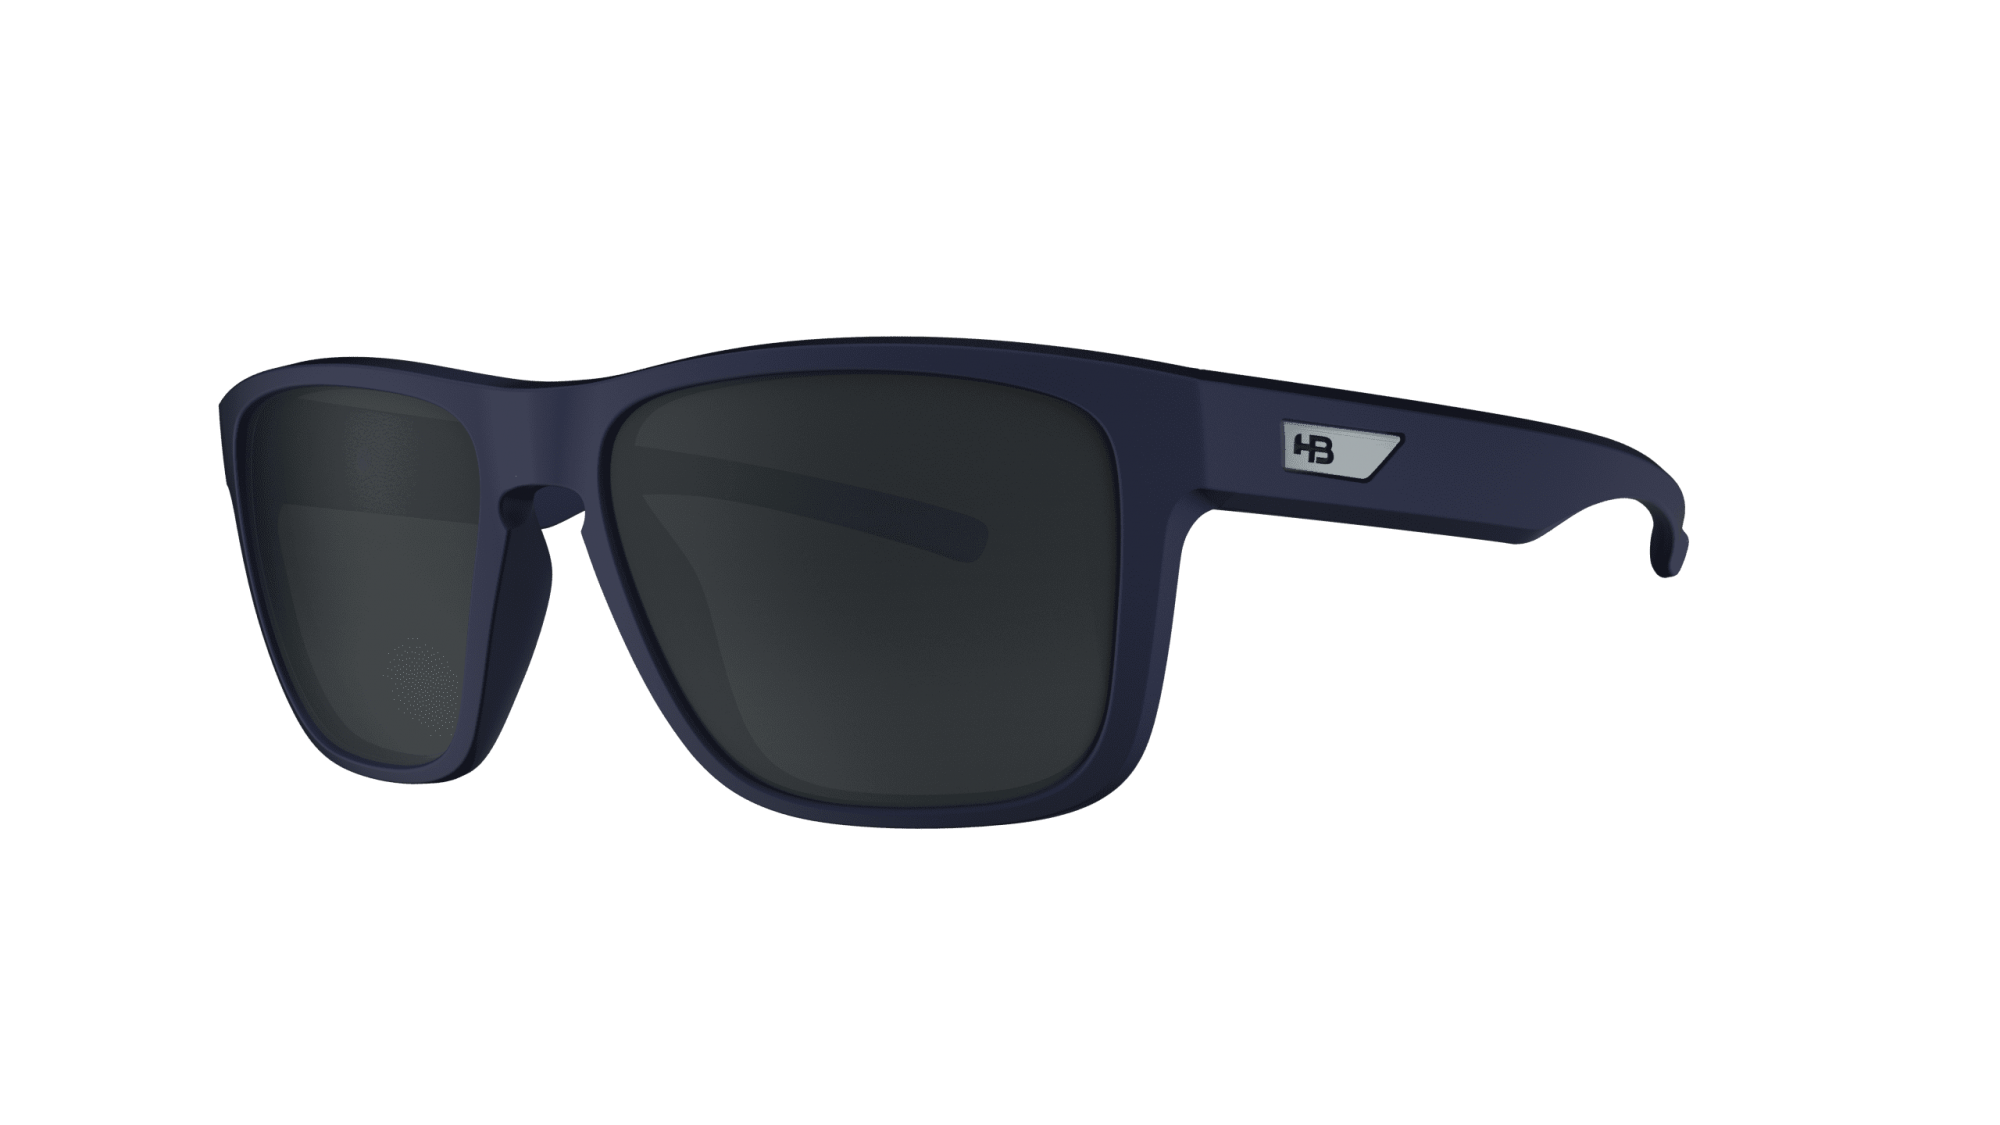 Óculos HB H-Bomb Matte Navy Gray